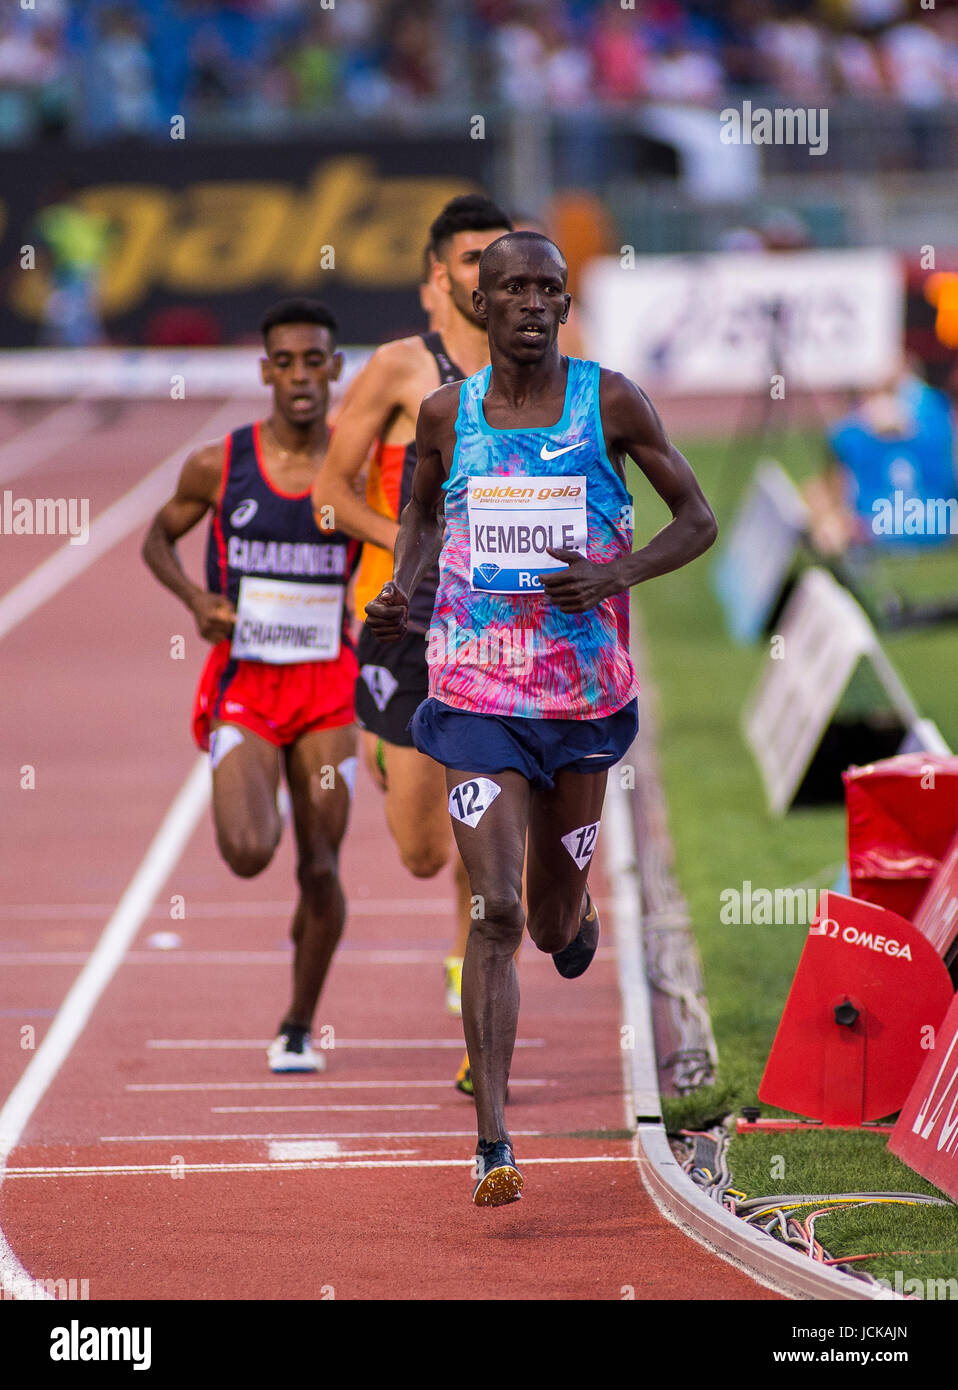 IAAF, Diamond League, Rome 2017 - Stock Image